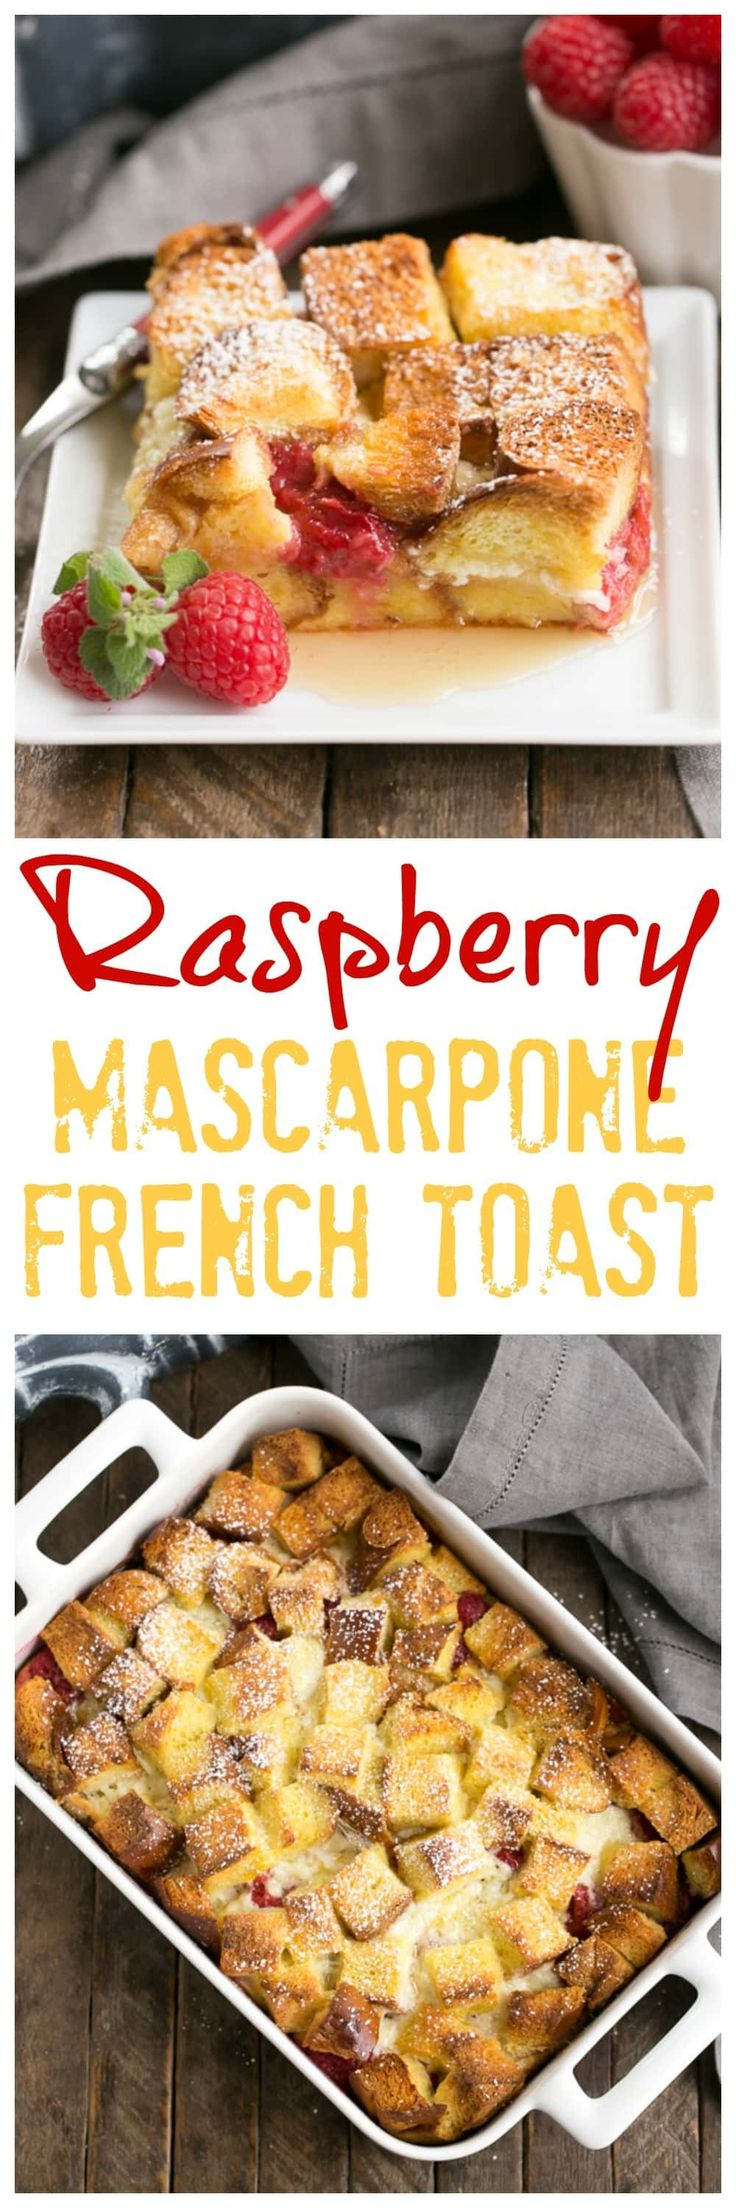 Raspberry Mascarpone French Toast Casserole | A delectable, make ahead breakfast strata filled with mascarpone cream and fresh raspberries #SundaySupper @lizzydo